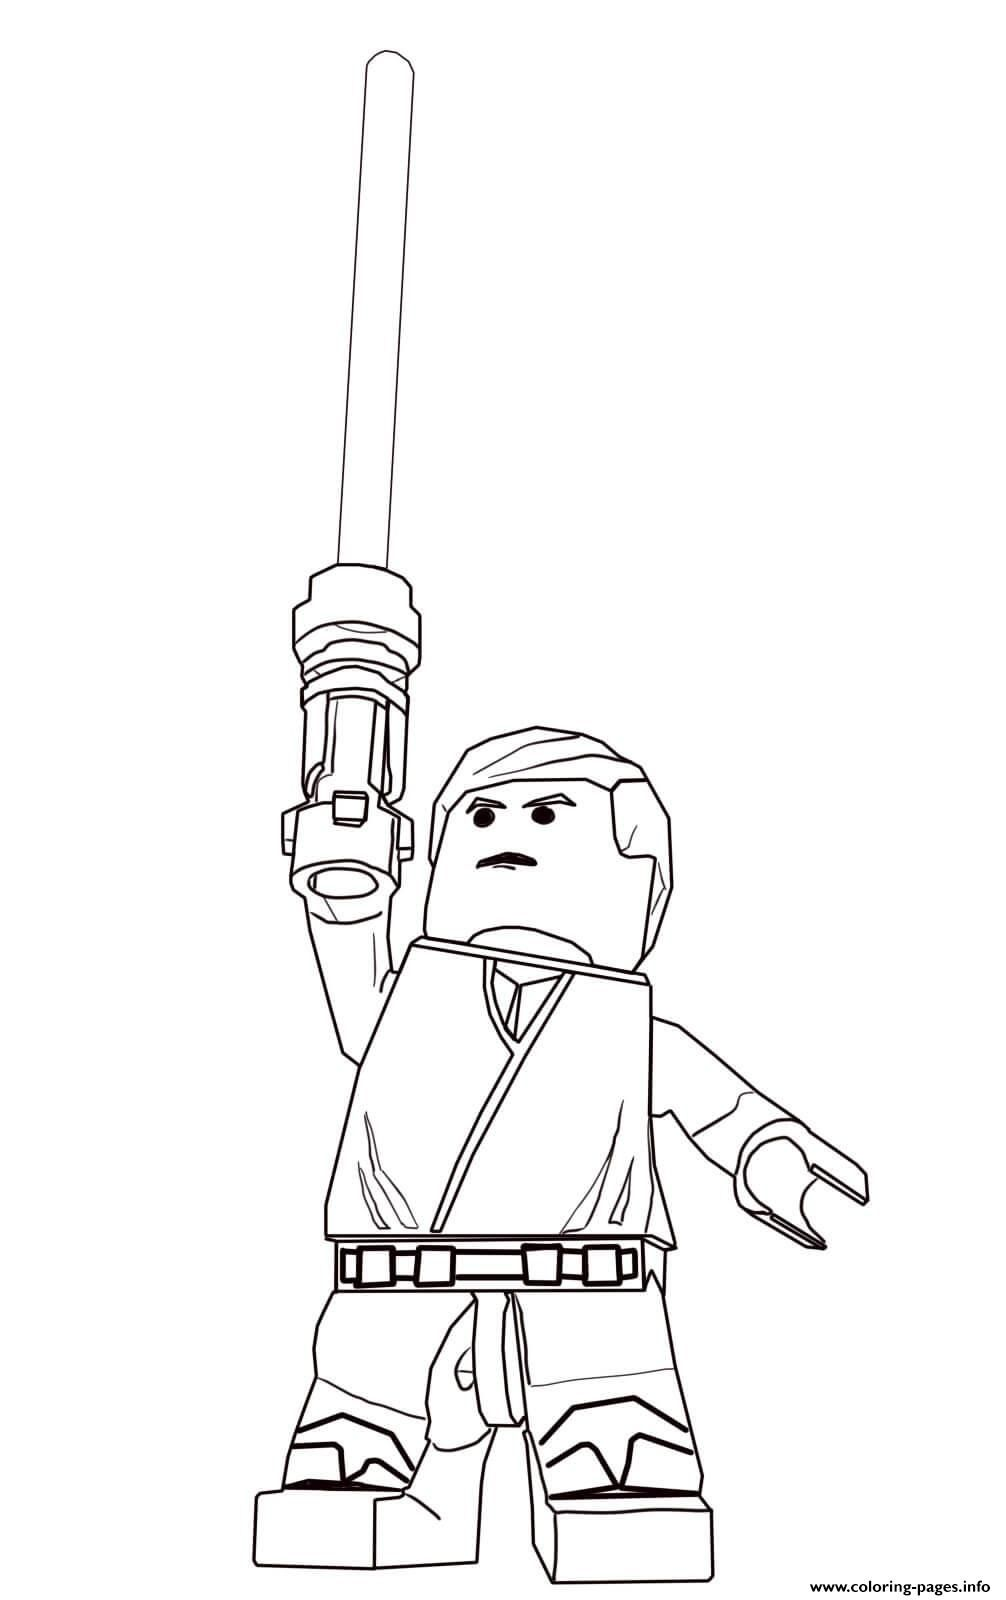 Print Lego Star Wars Luke Skywalker Coloring Pages Star Wars Prints Lego Coloring Pages Star Wars Colors